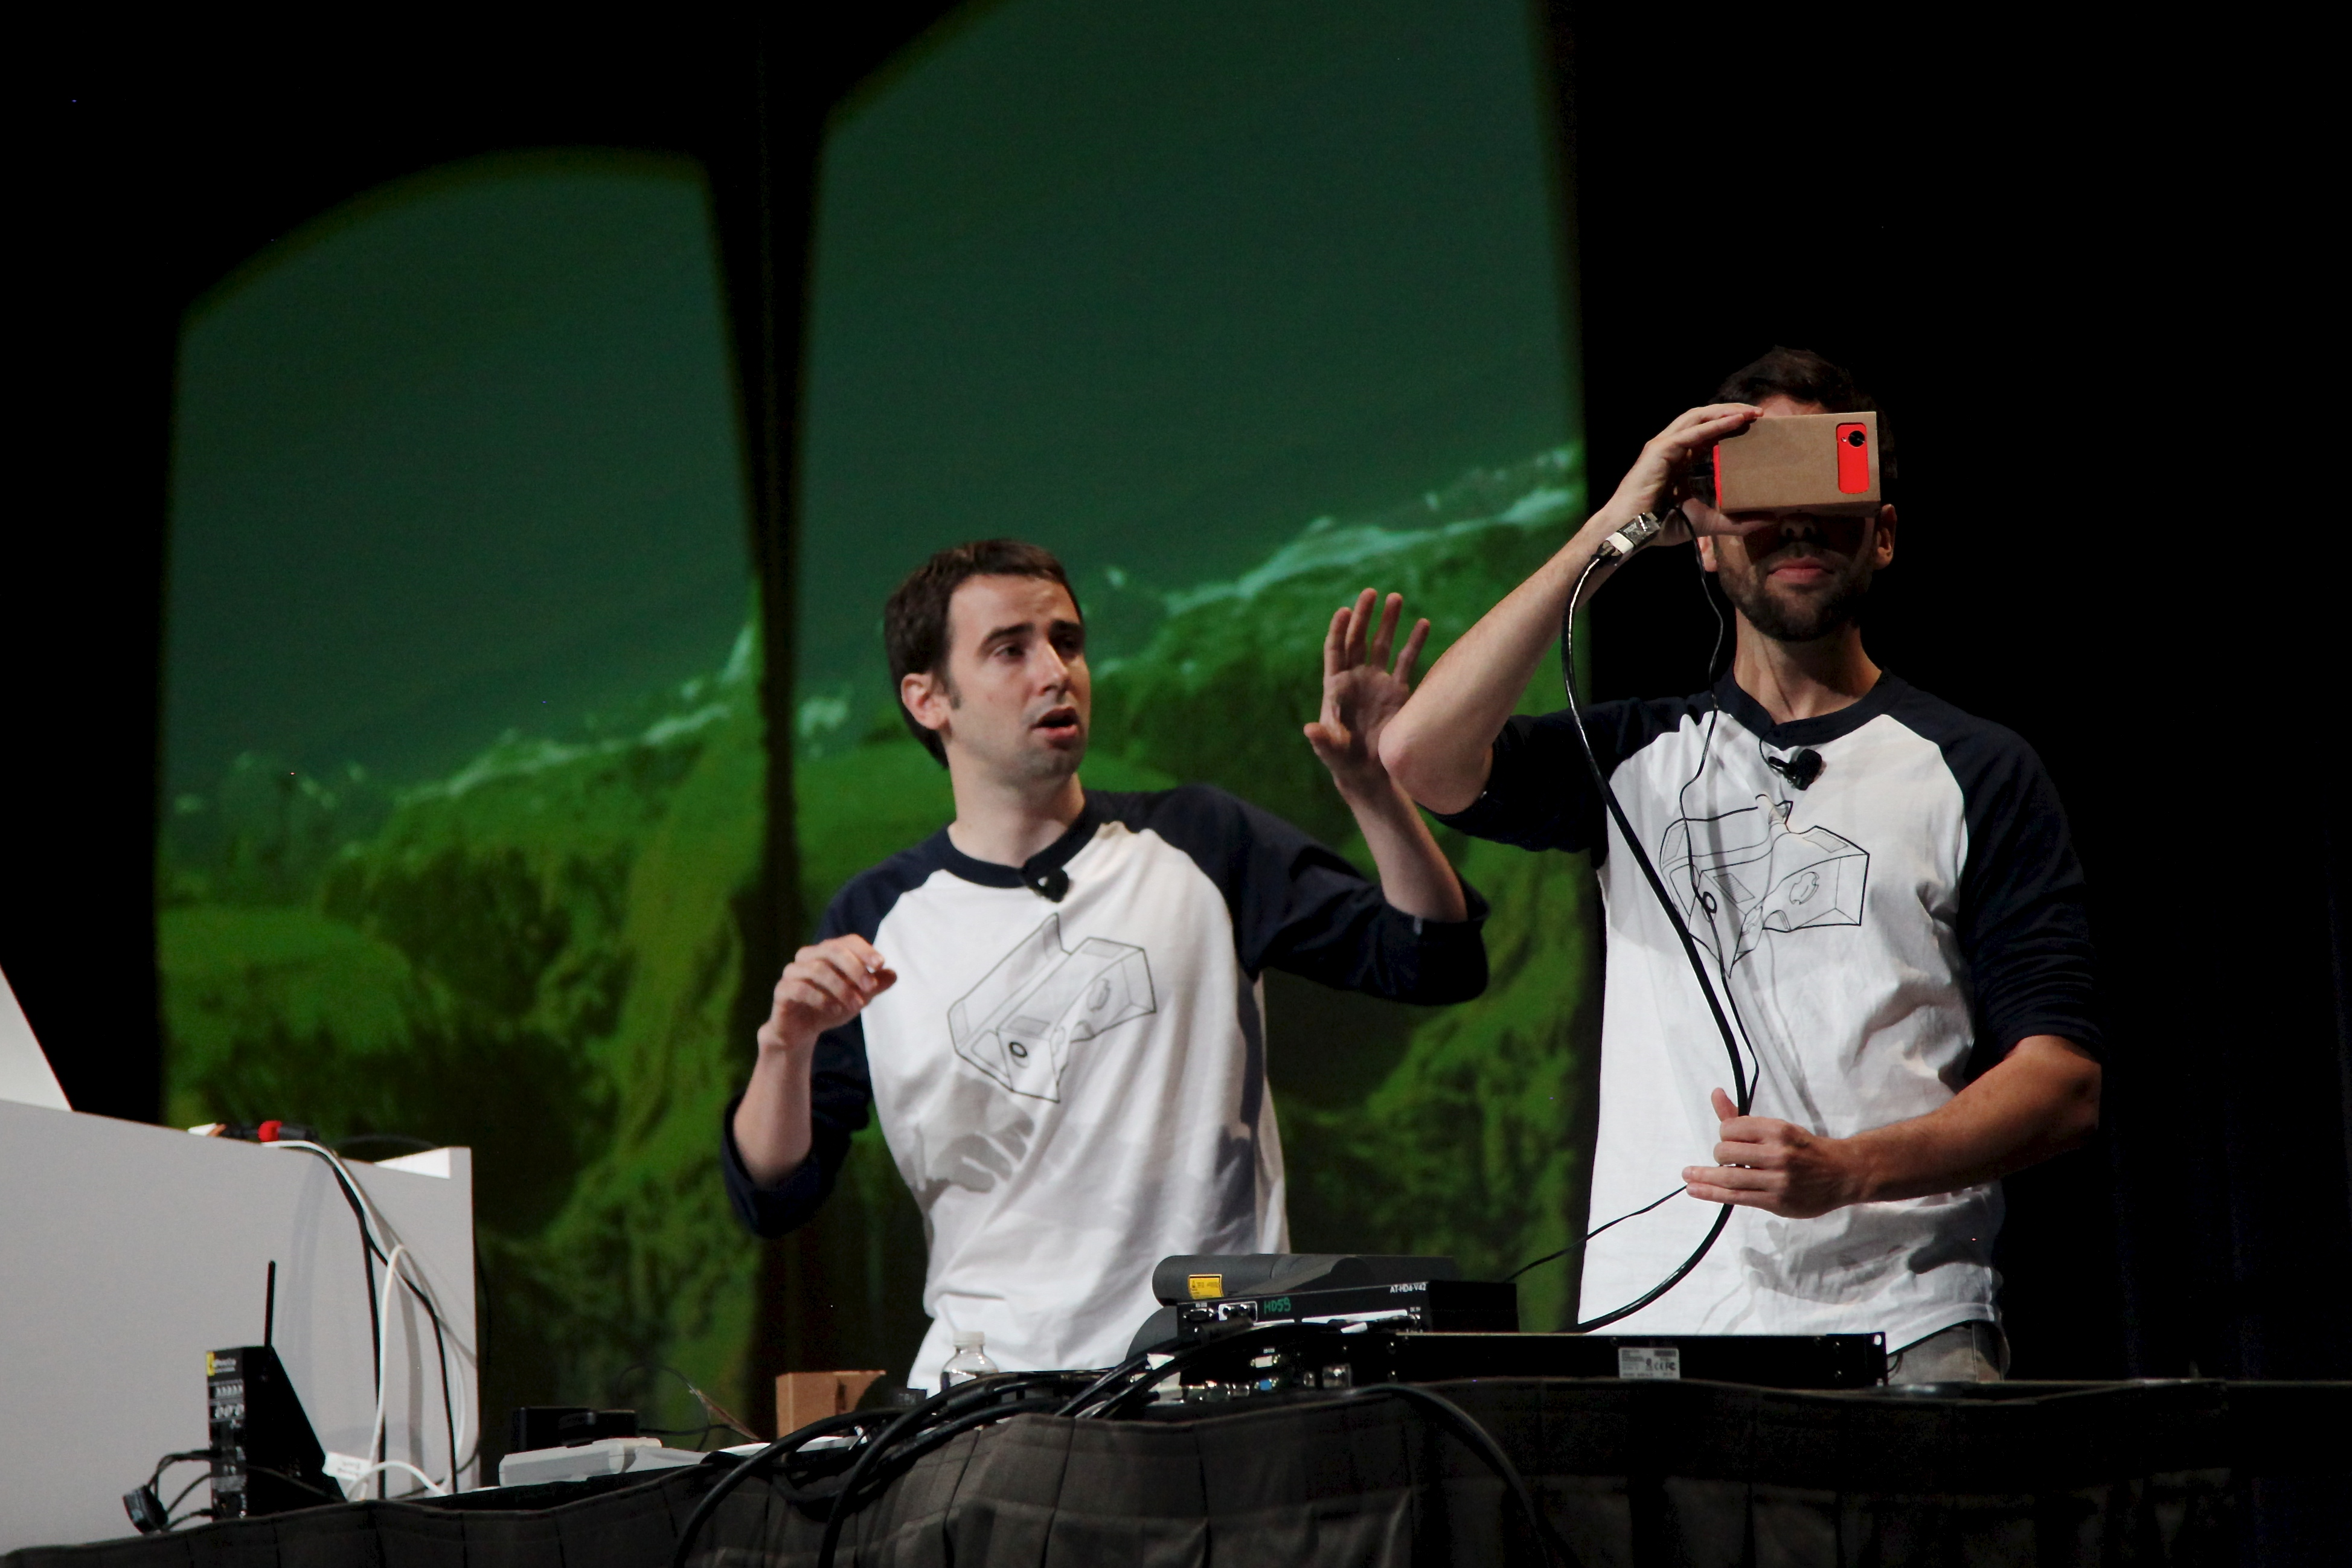 David Coz and Boris Smus demonstrate Cardboard at Google I/O.